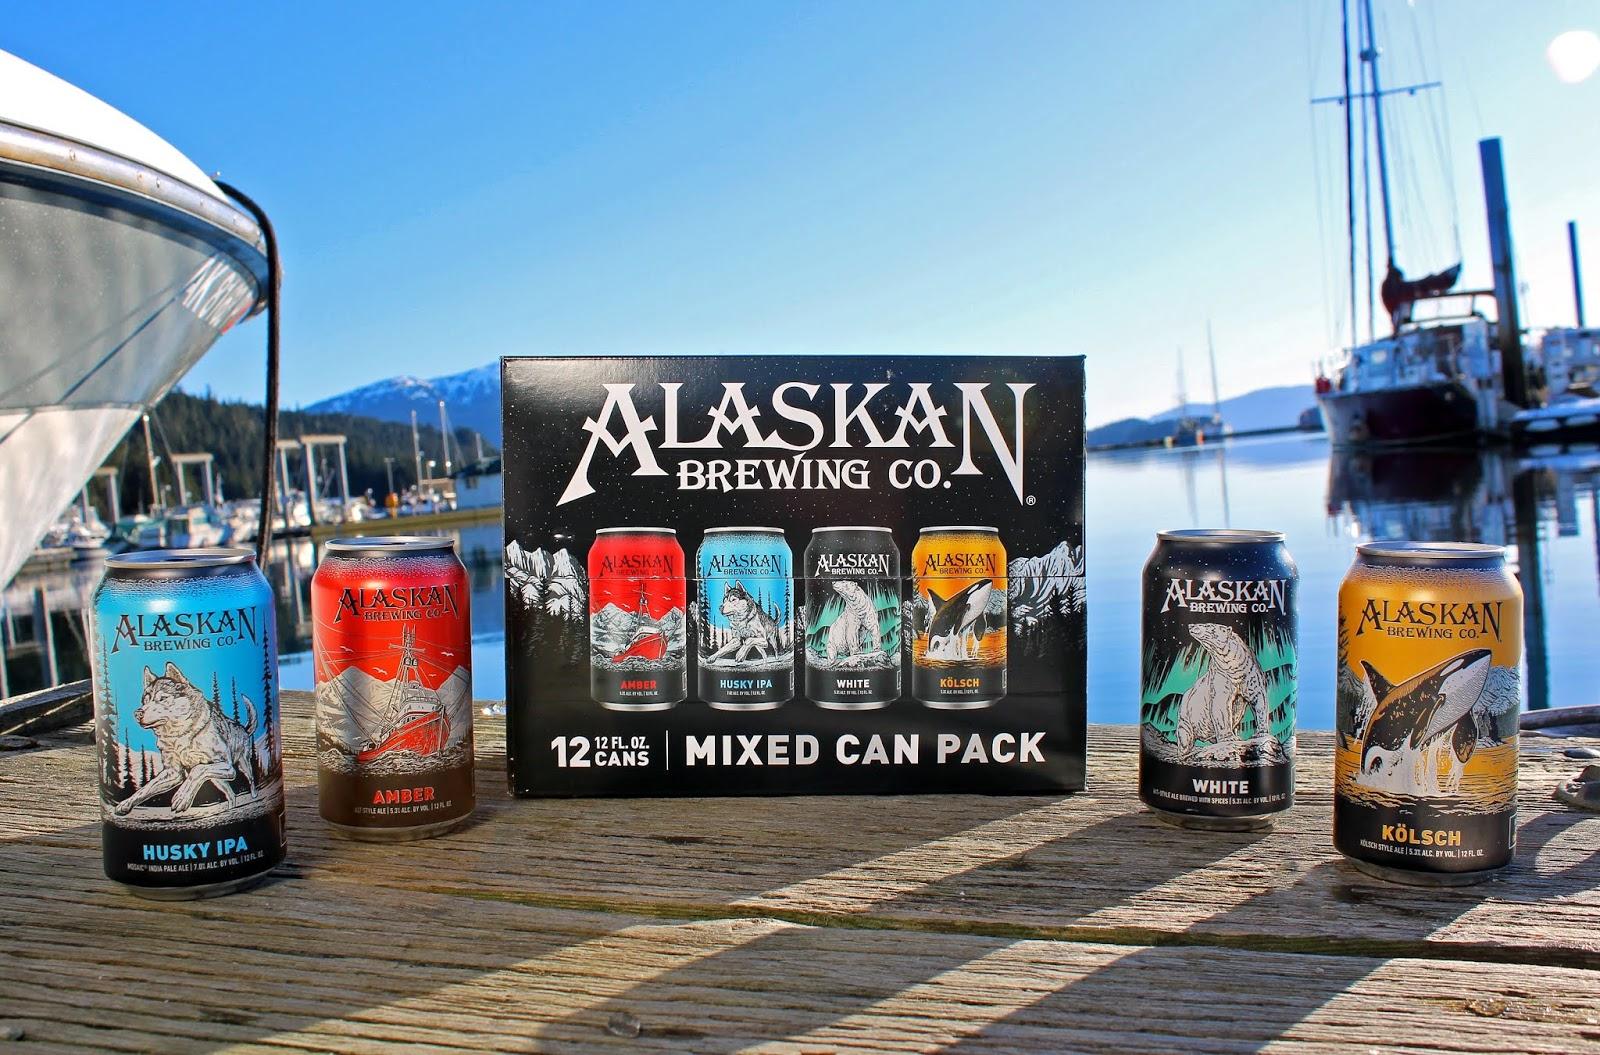 AlaskanBrewing05.jpg